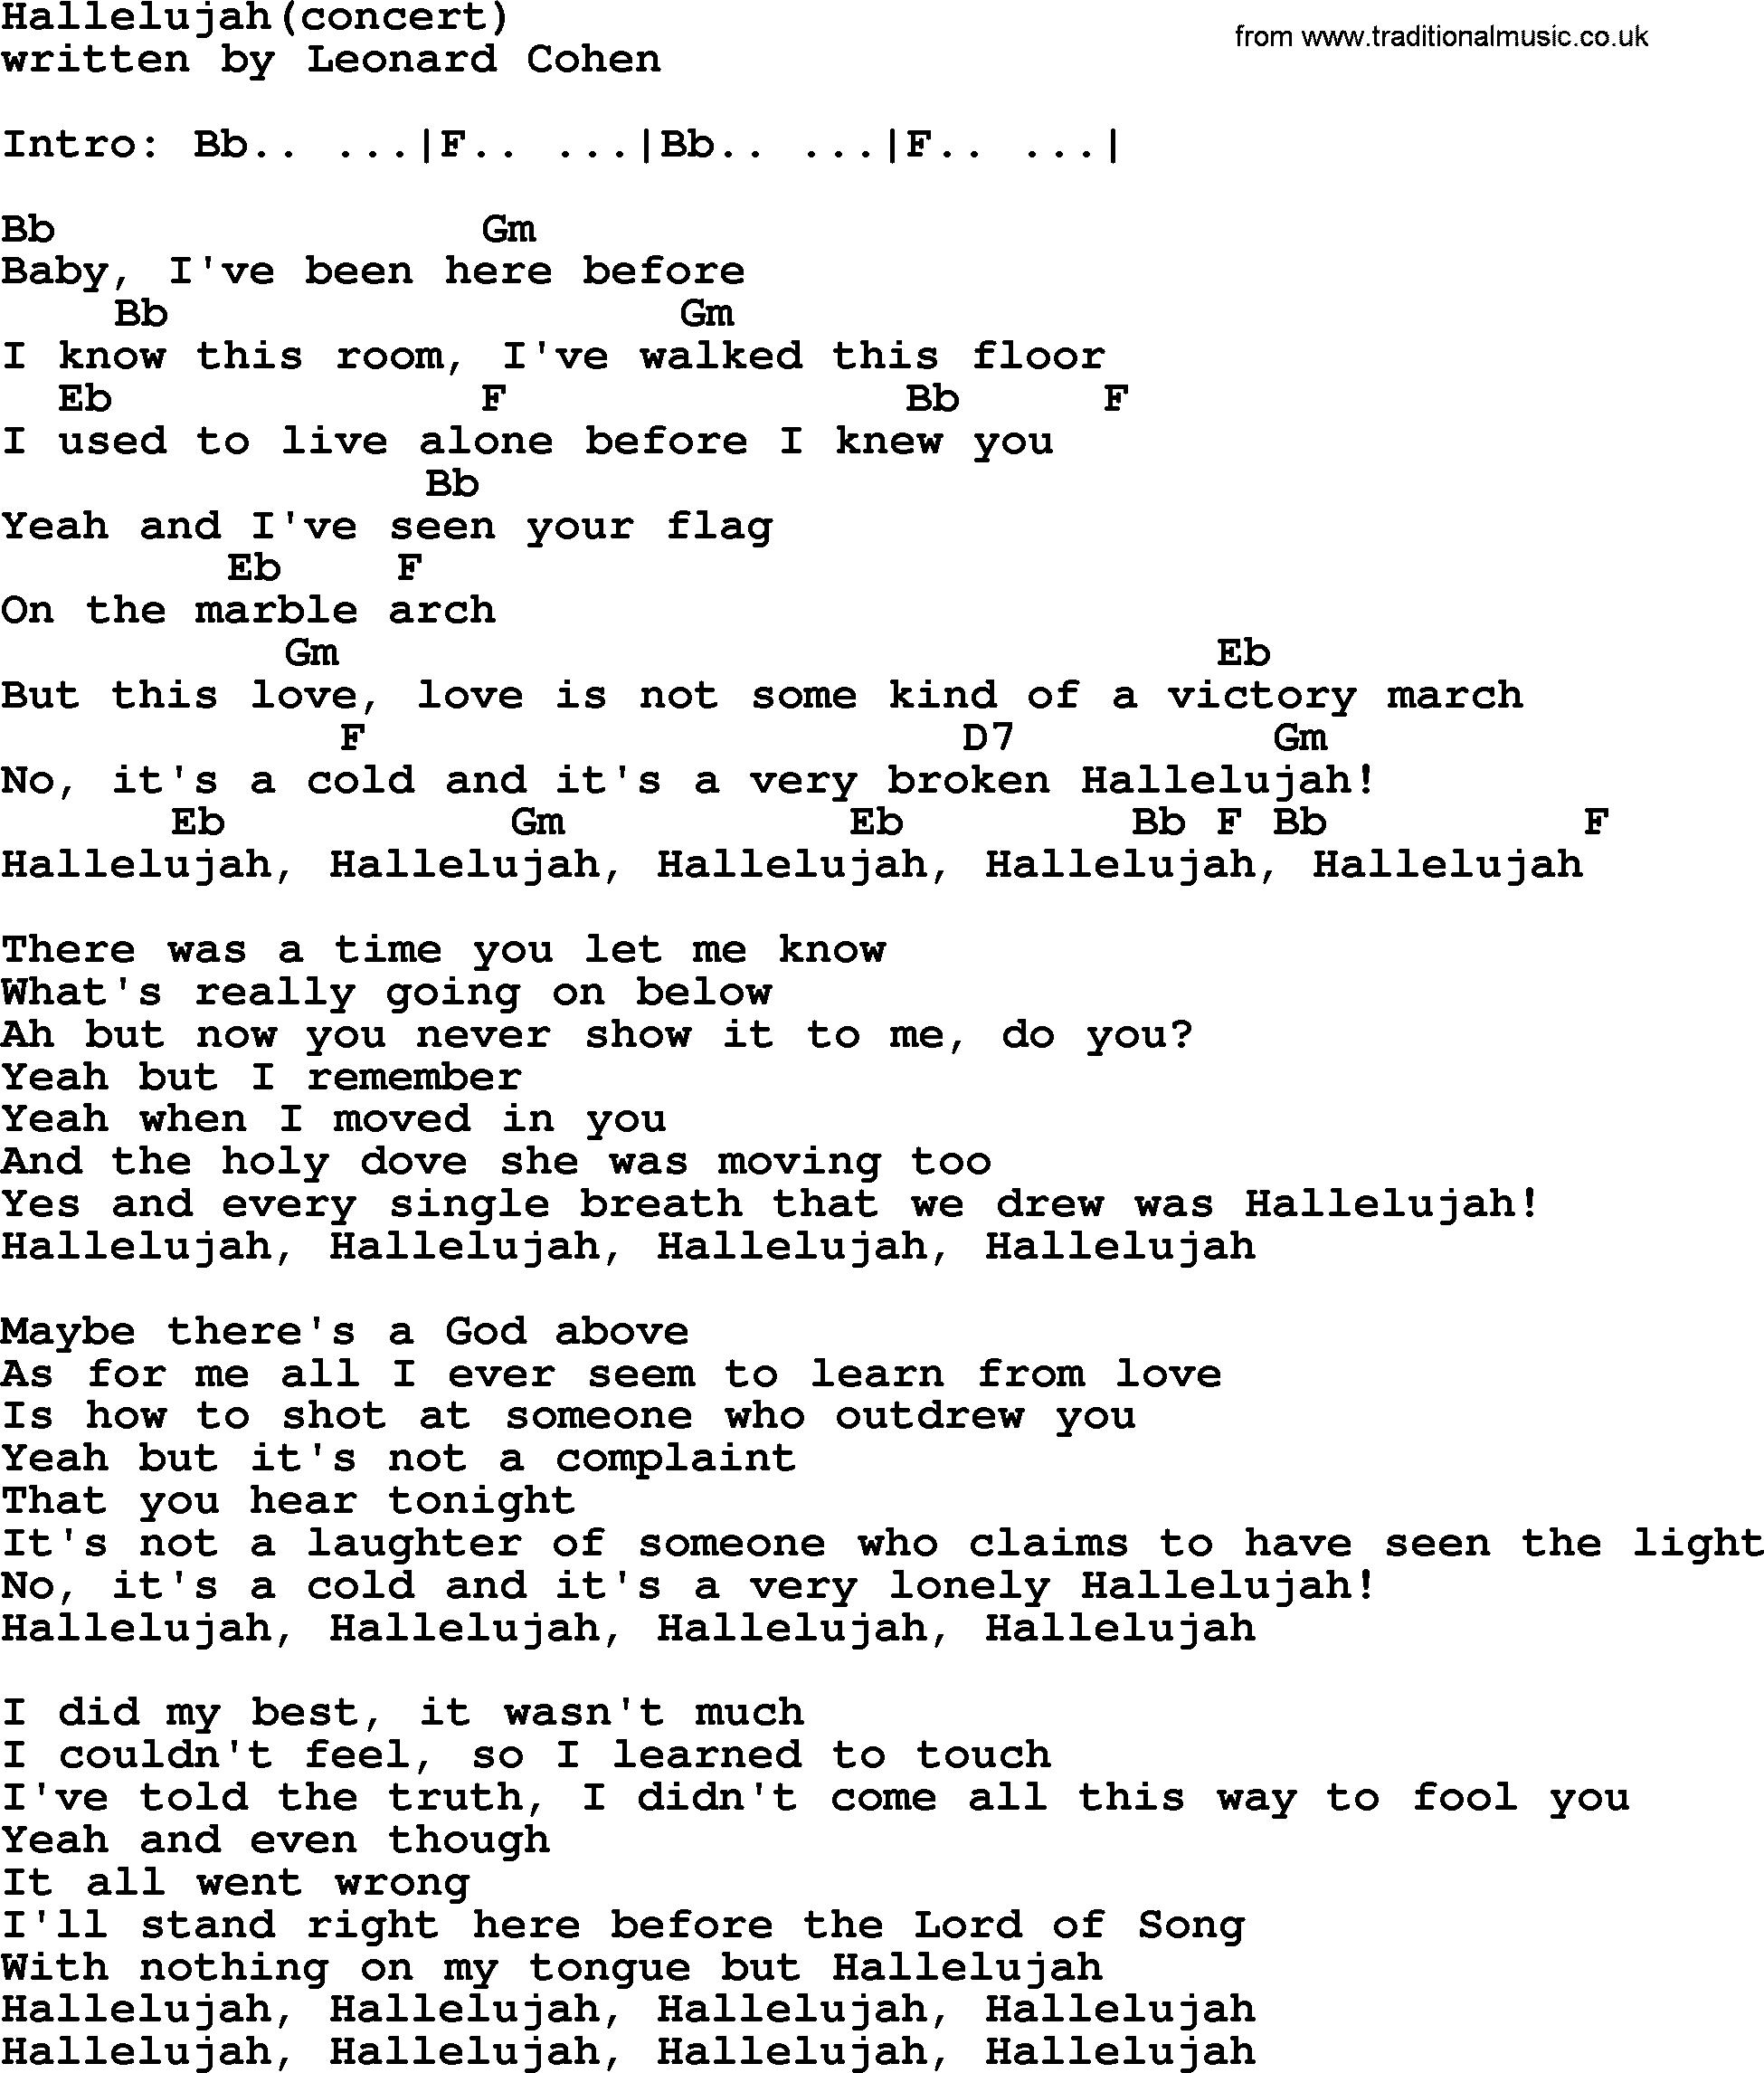 Hallelujah Ukulele Chords Leonard Cohen Song Hallelujahconcert Lyrics And Chords